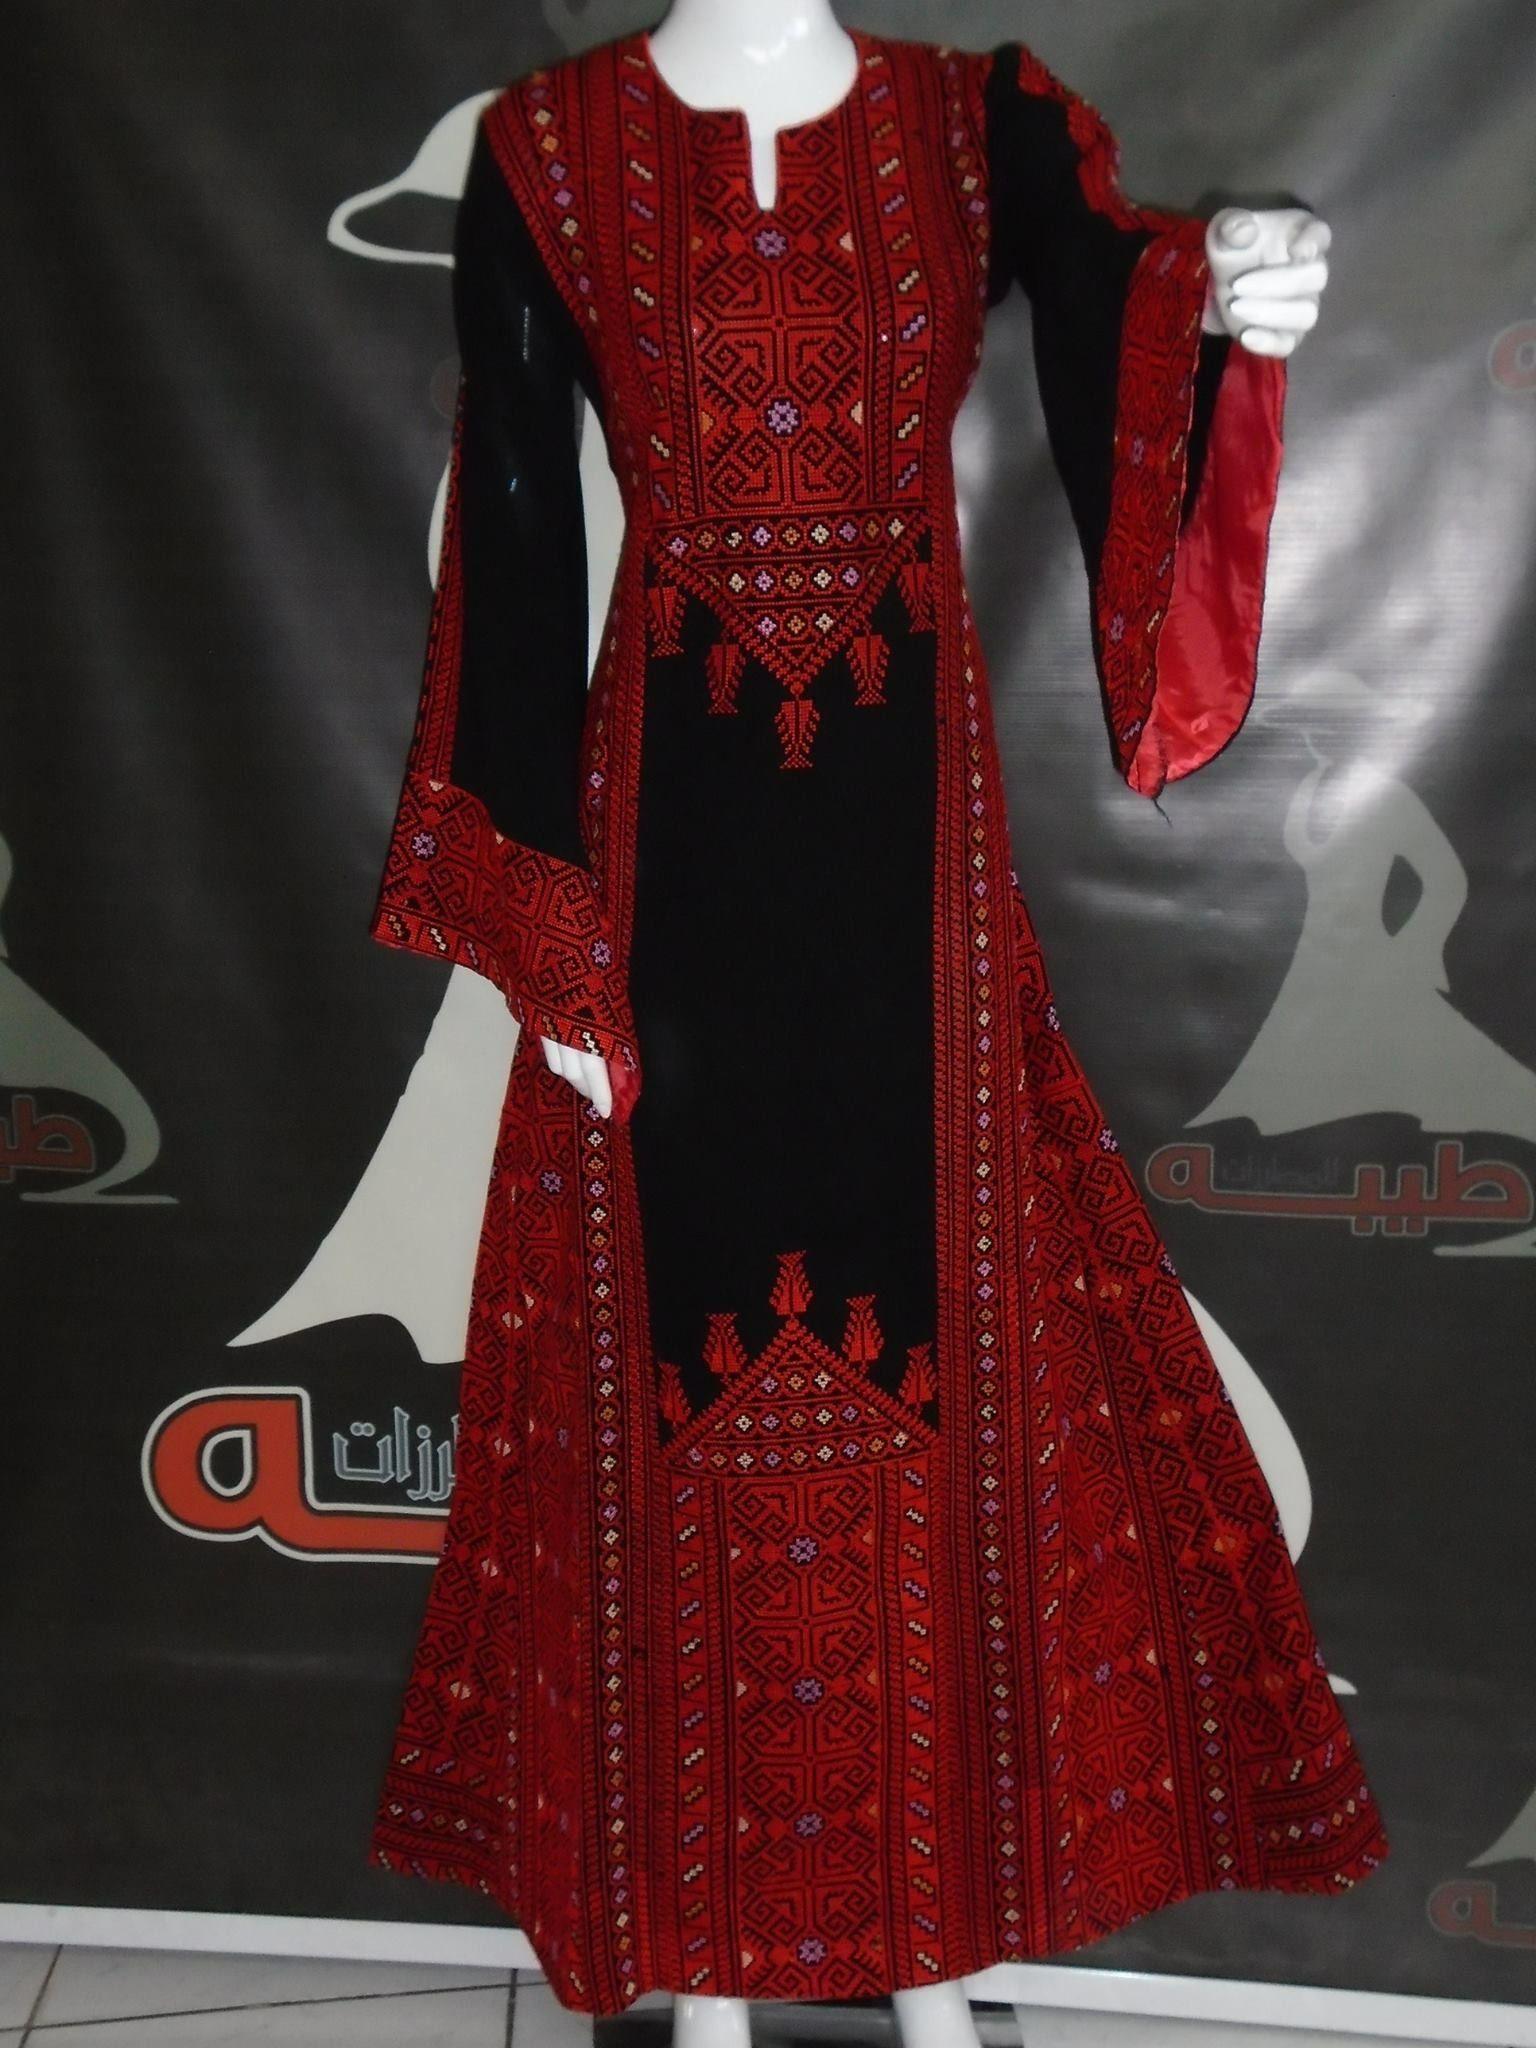 Pin by sadeel on تطريز فلسطيني pinterest arabic dress costumes